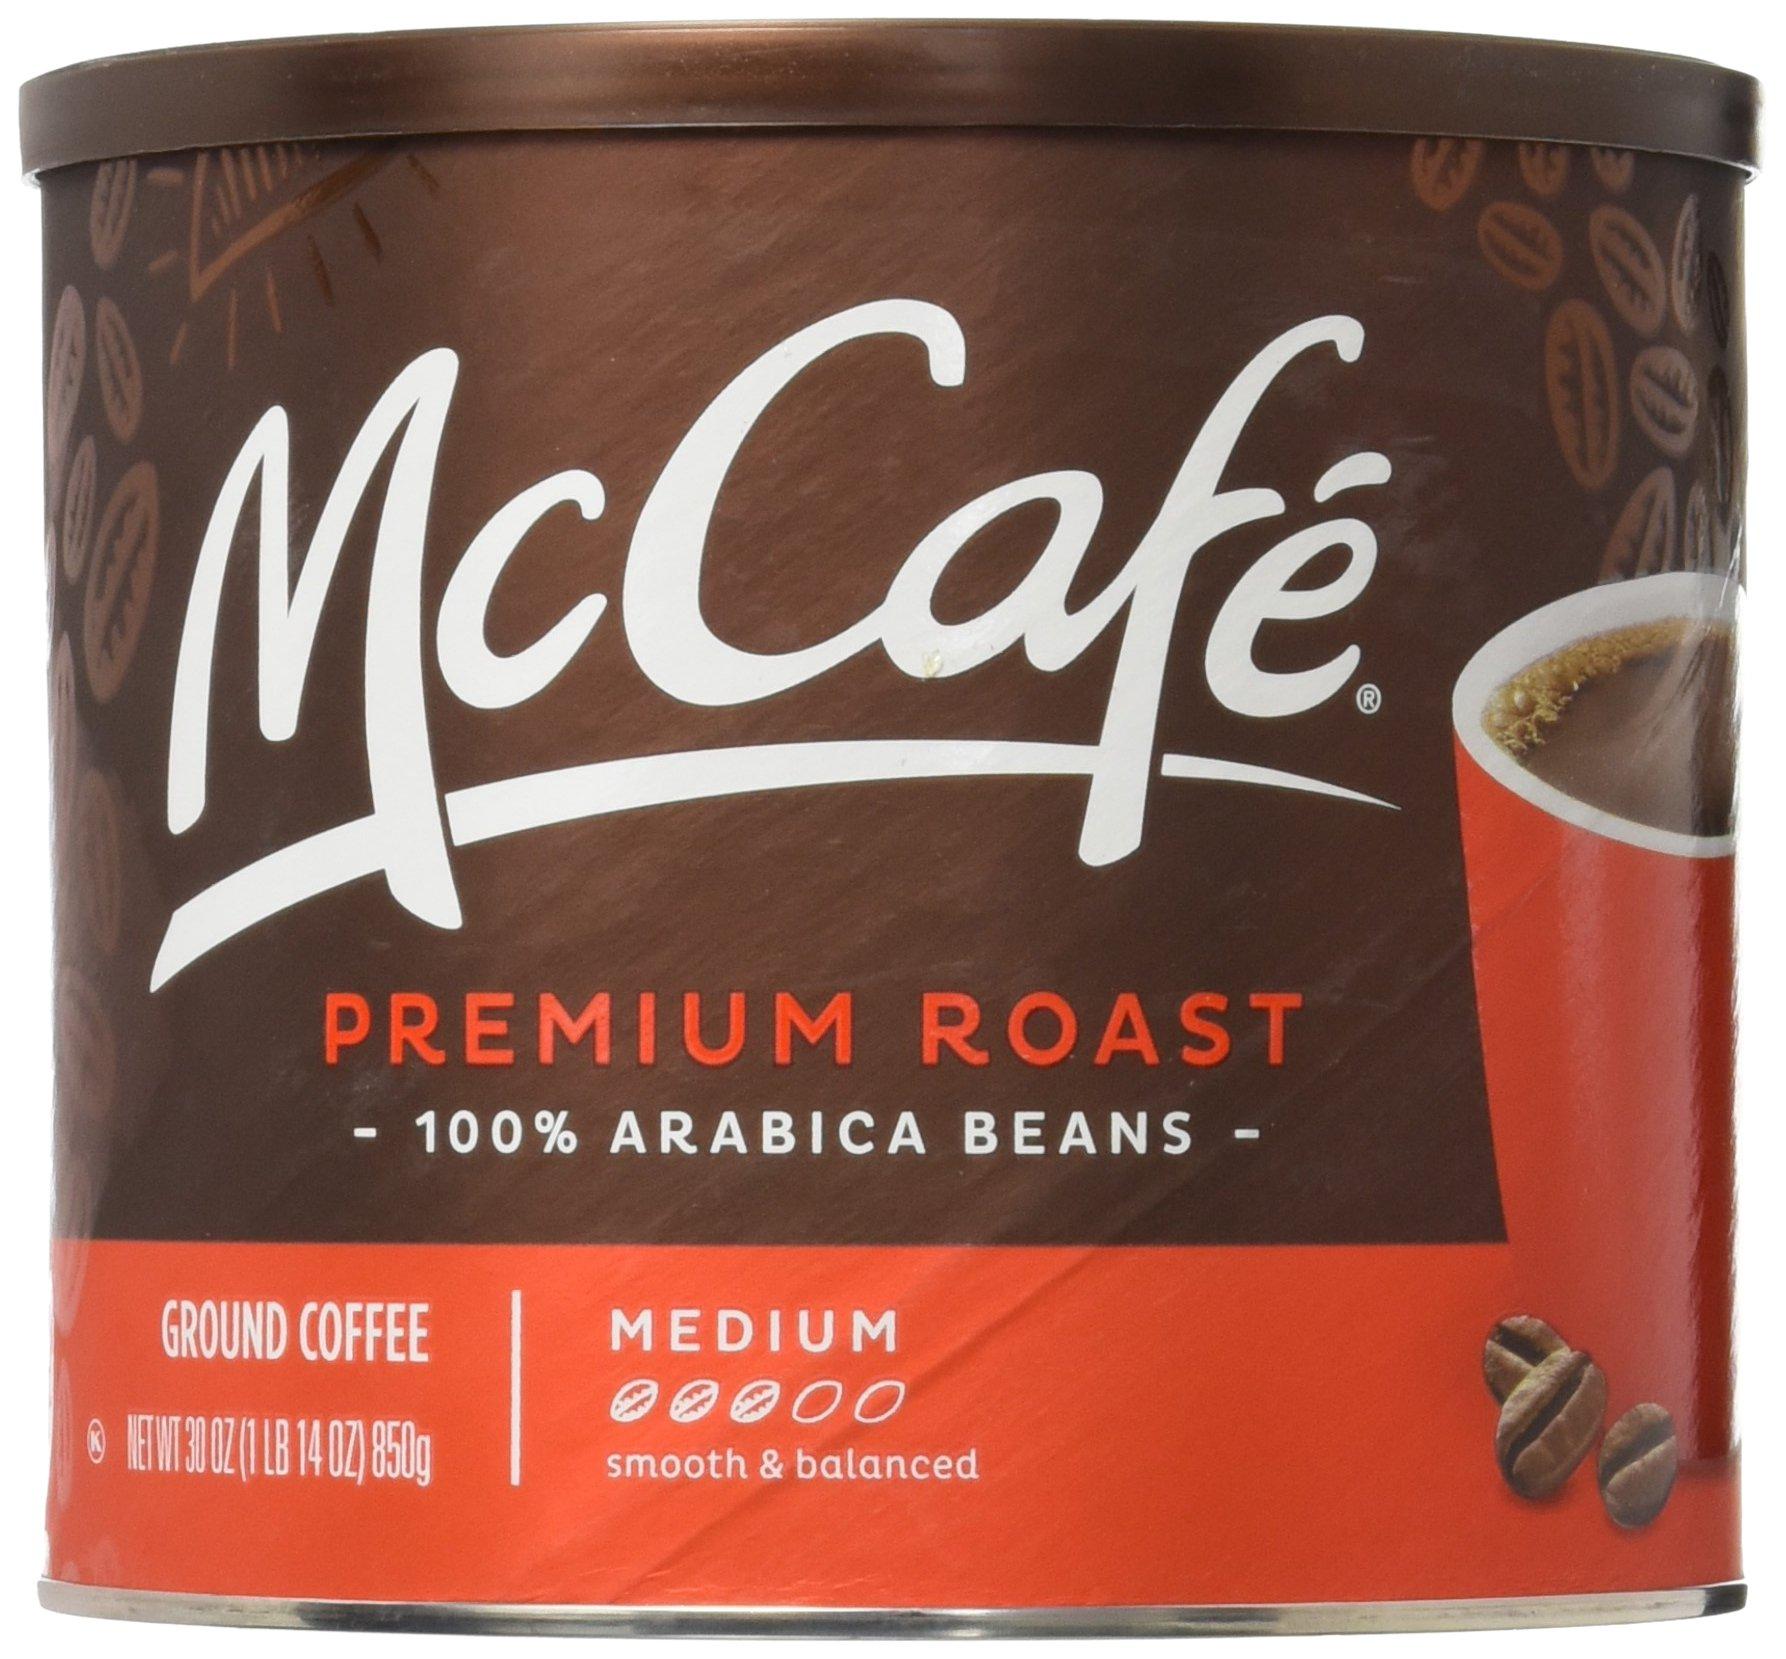 amazon com mcdonalds mccafe premium roast ground coffee bag 12